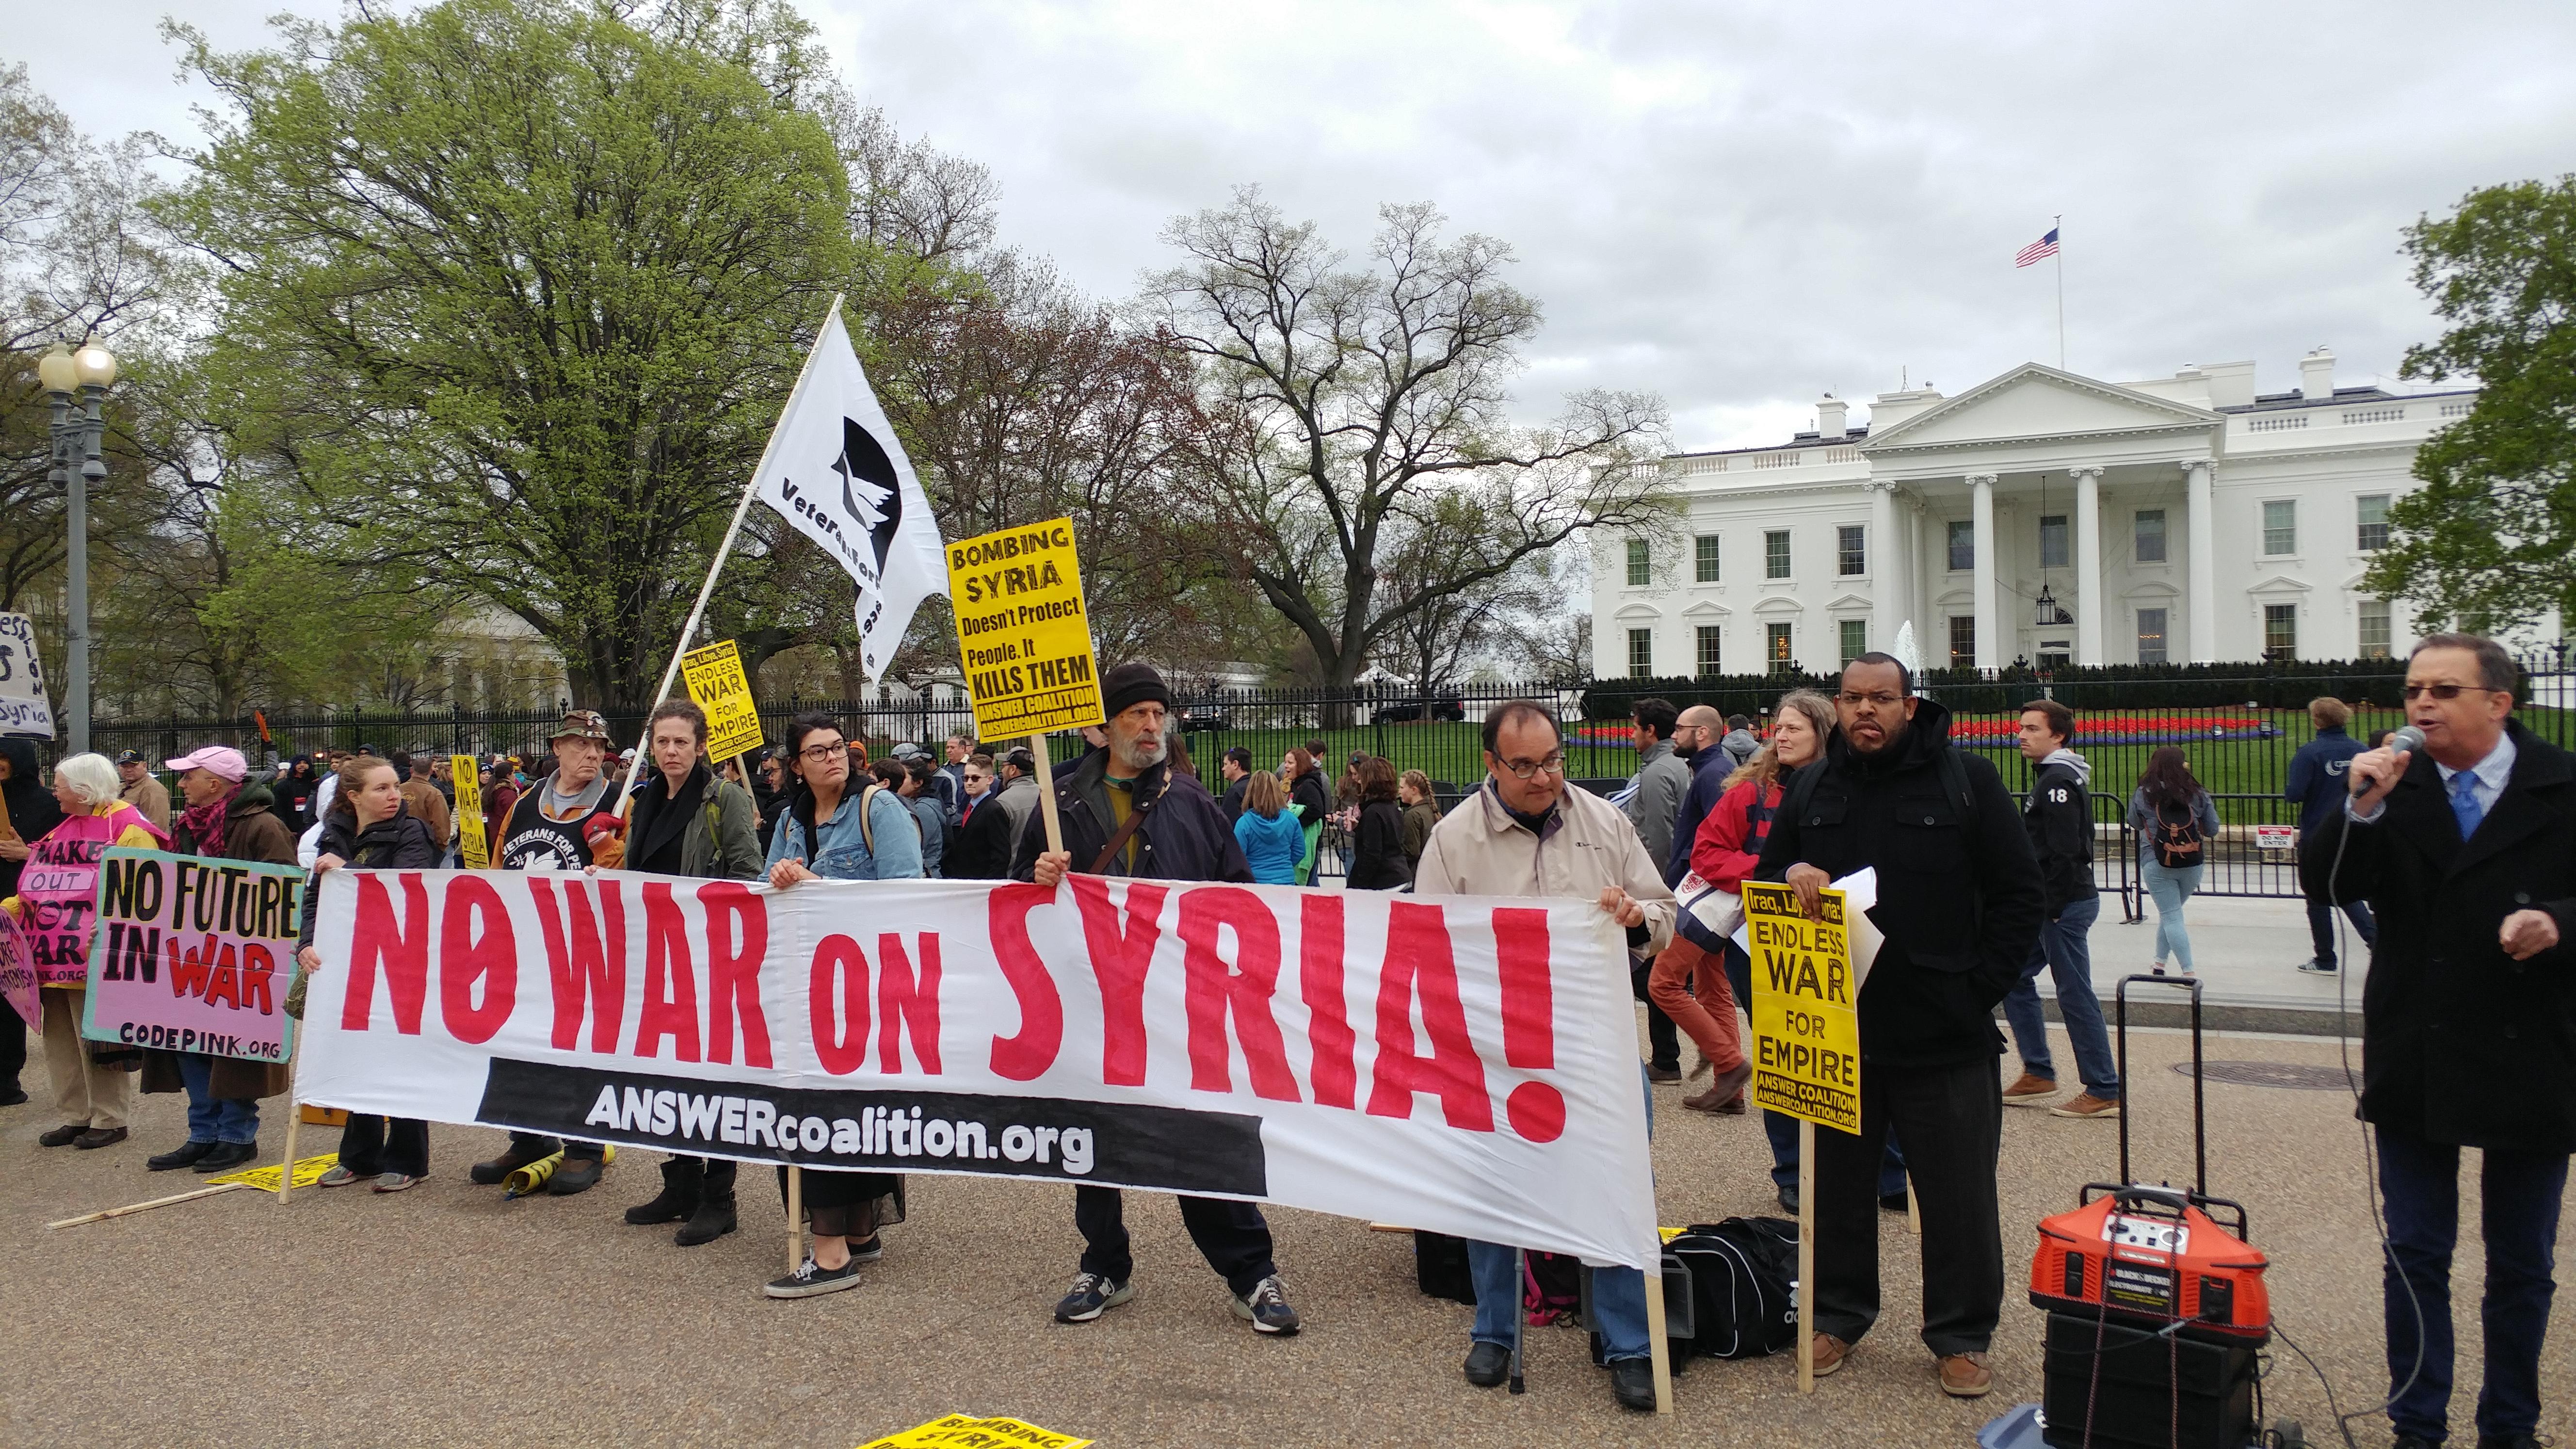 Syria_DC_04.07.17_(02).jpg